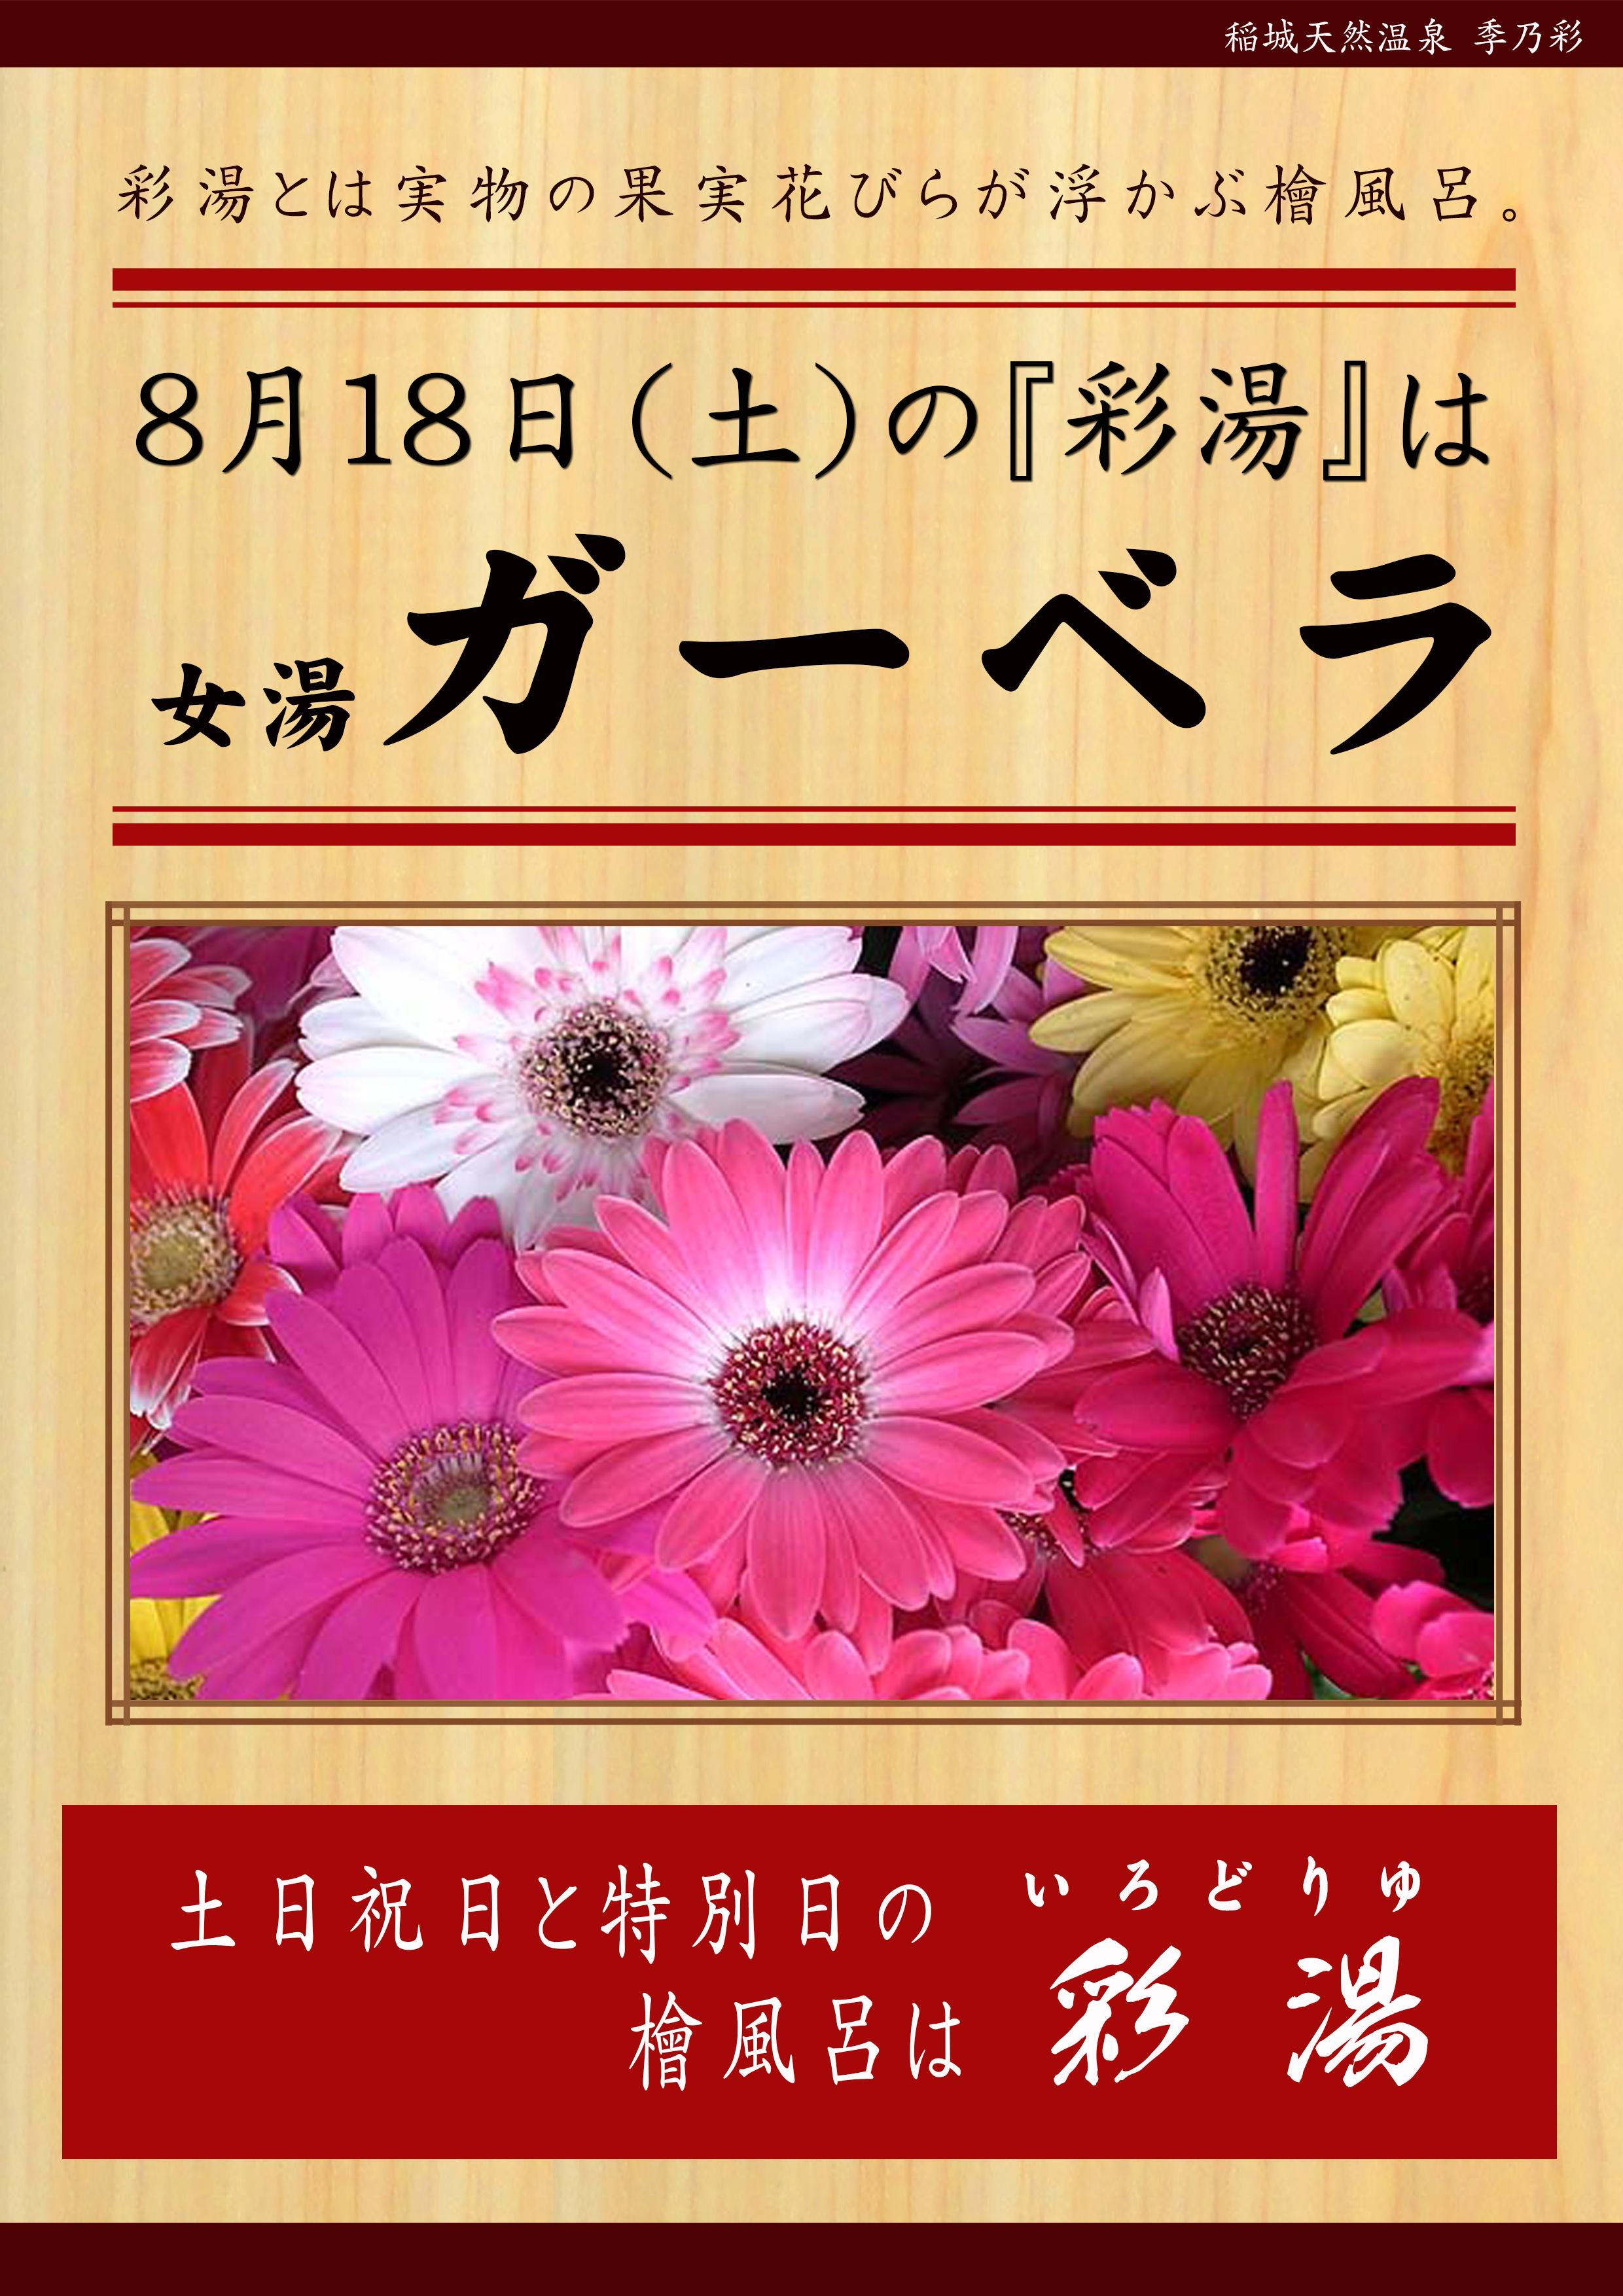 20180818POP イベント 彩湯 女湯 ガーベラ